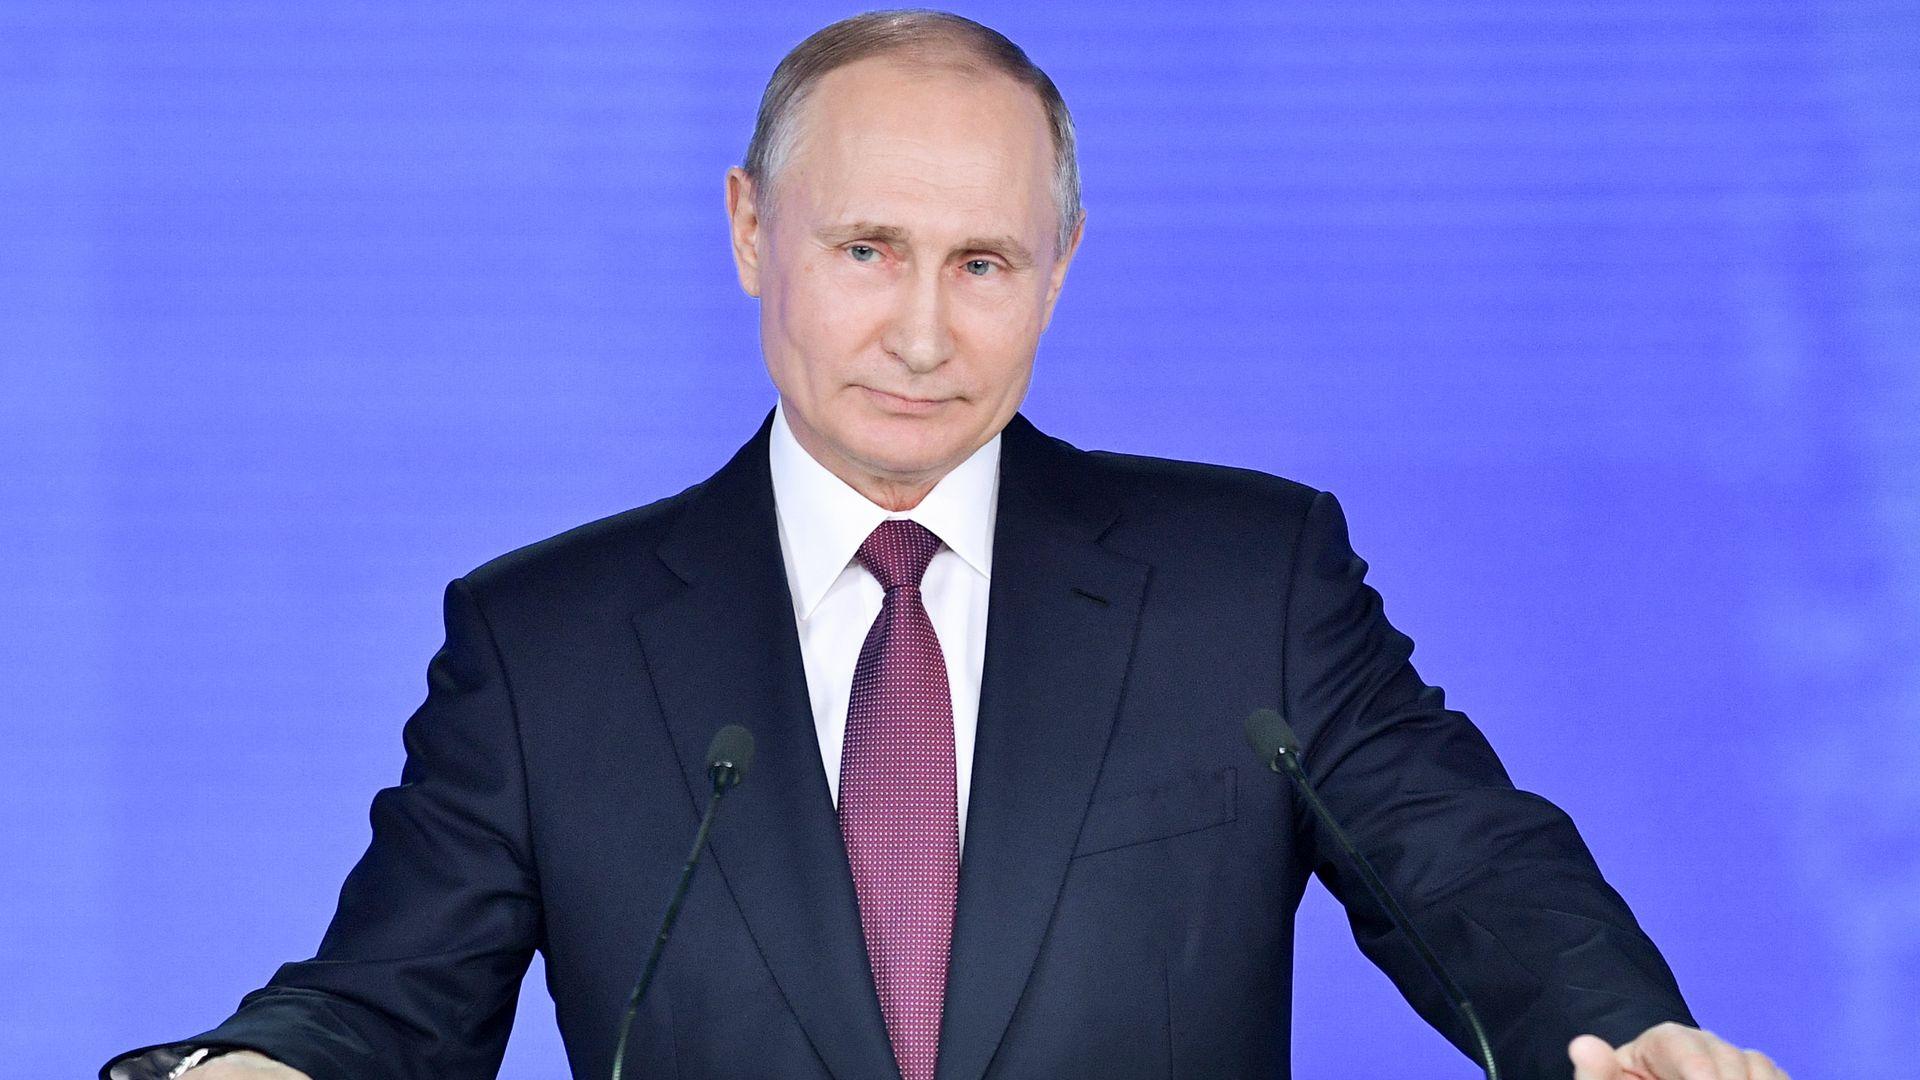 Vladimir Putin at lectern